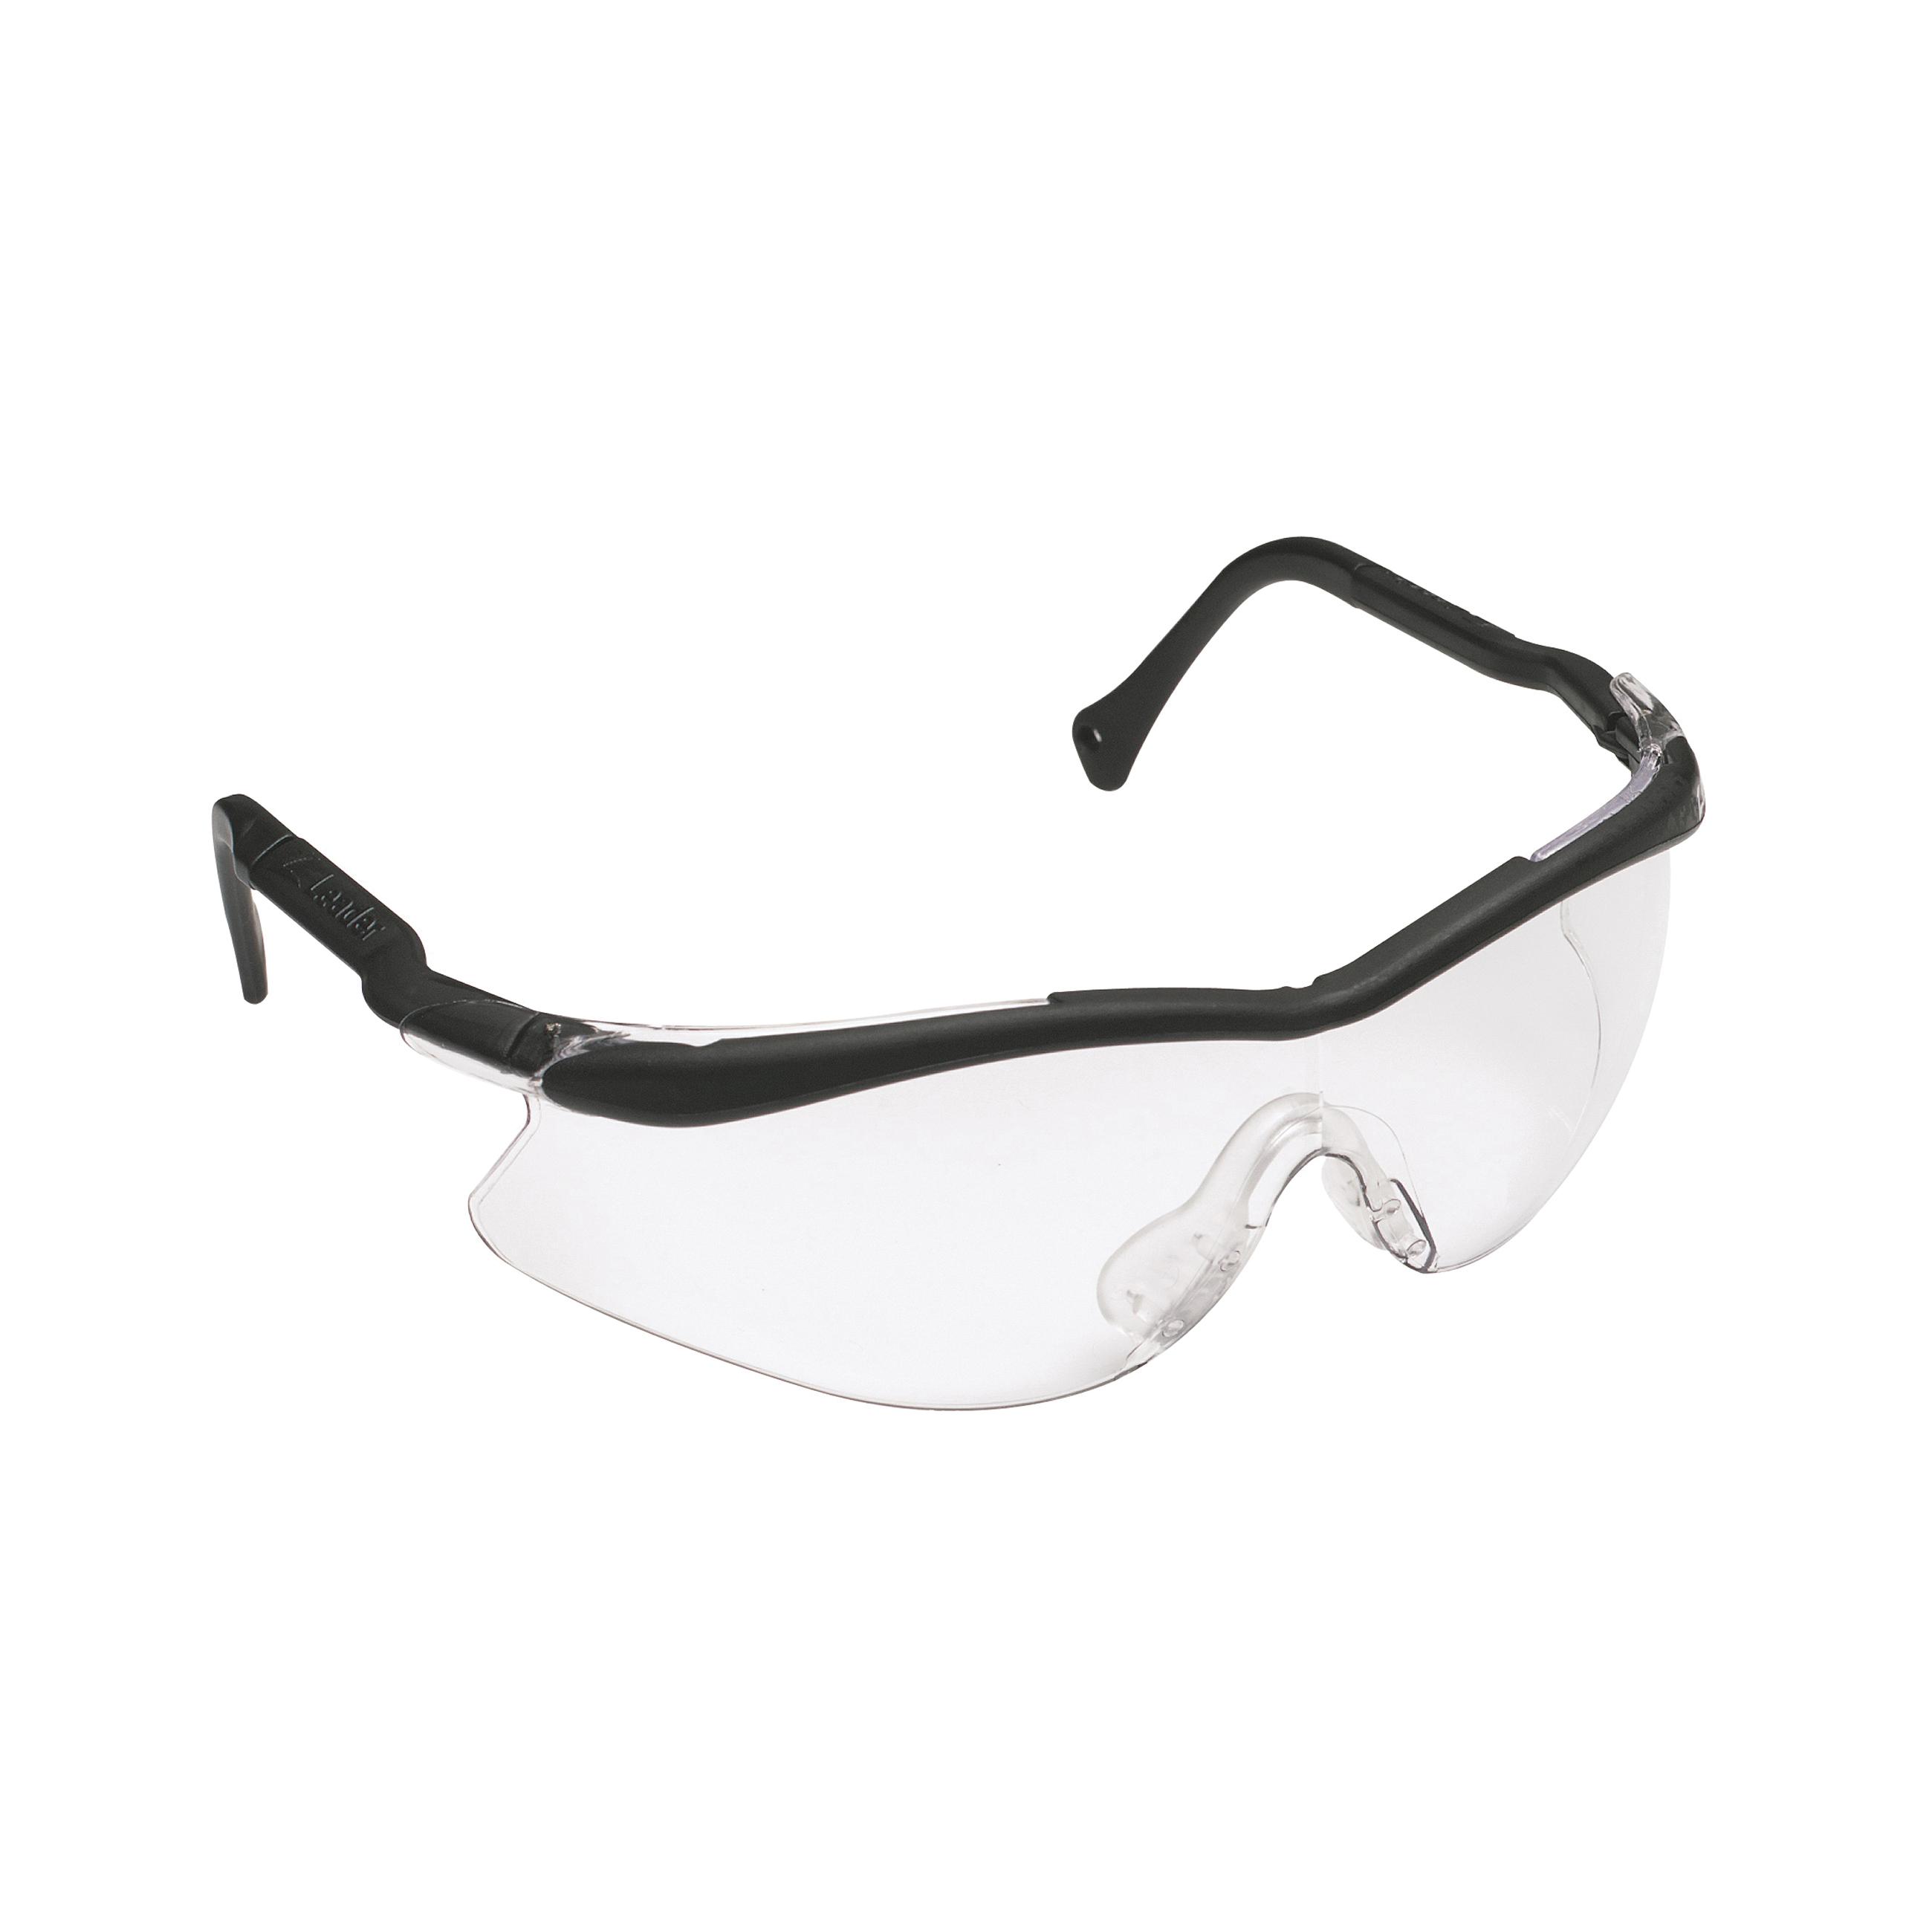 3M™ QX™ 078371-62209 12109-10000-20 2000 Value Range Protective Eyewear, Anti-Fog/Anti-Scratch Clear Lens, Half Framed Black Plastic Frame, Polycarbonate Lens, Specifications Met: ANSI Z87.1-2015